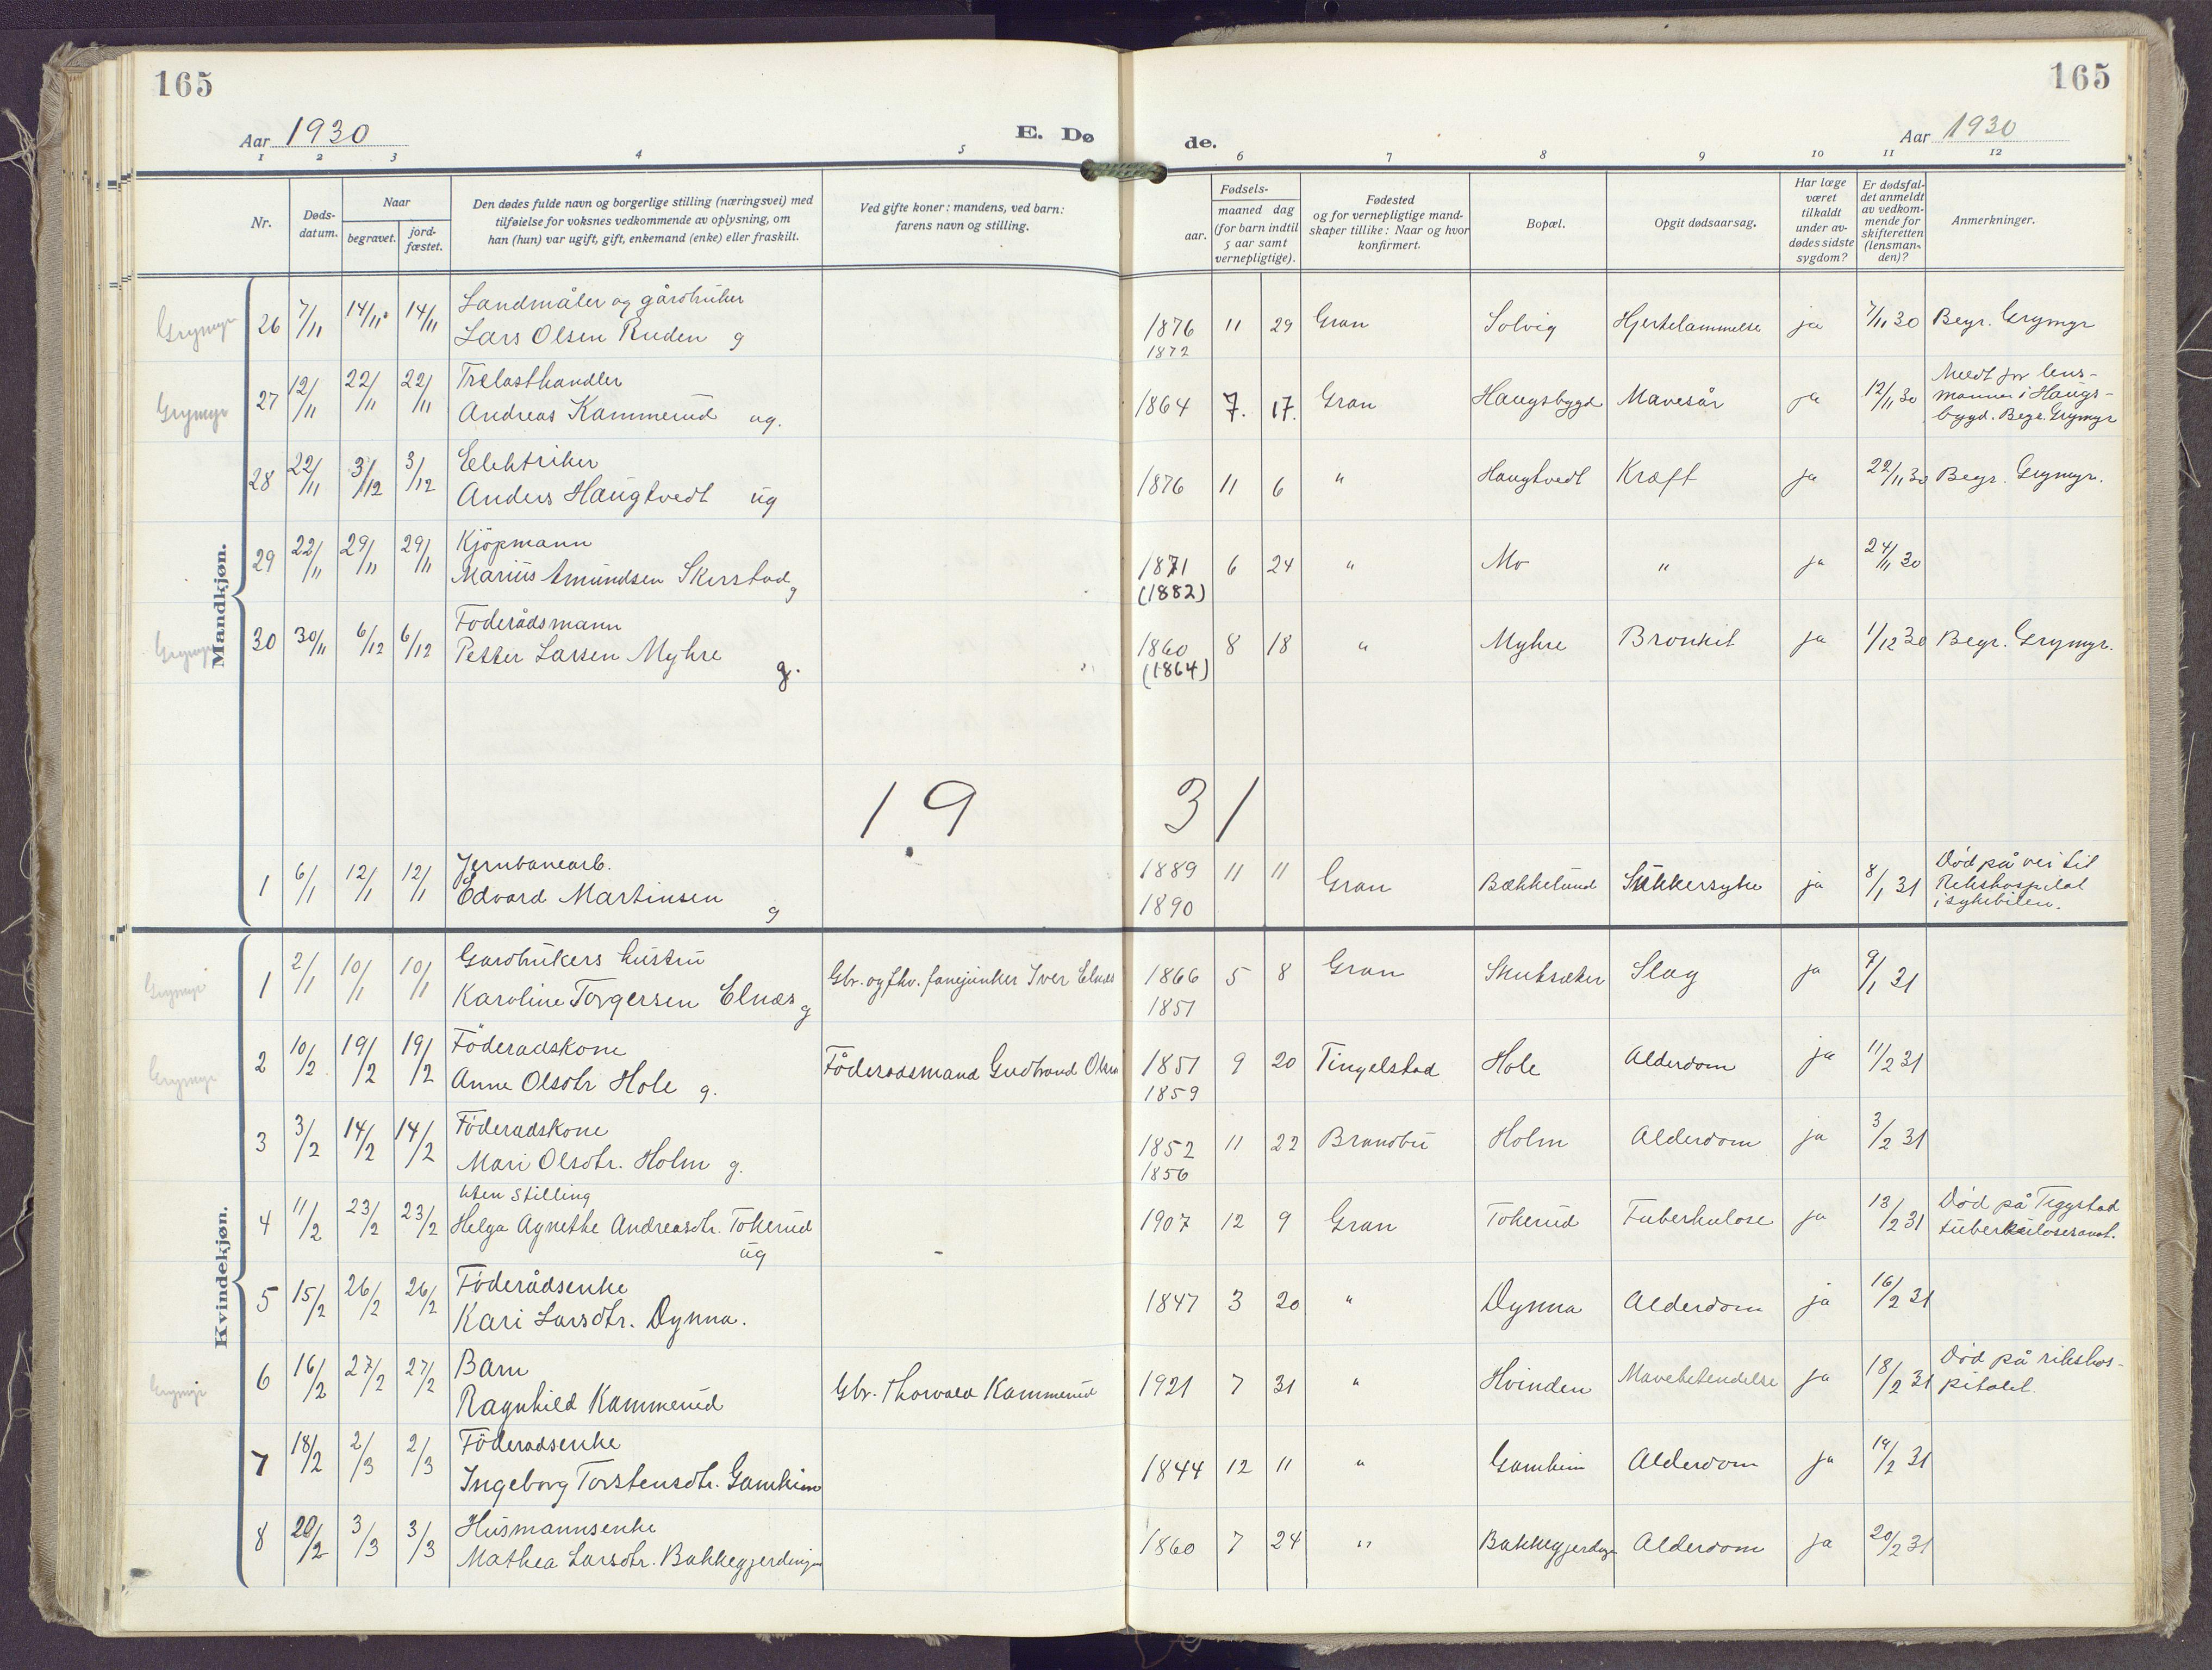 SAH, Gran prestekontor, Ministerialbok nr. 23, 1919-1938, s. 165